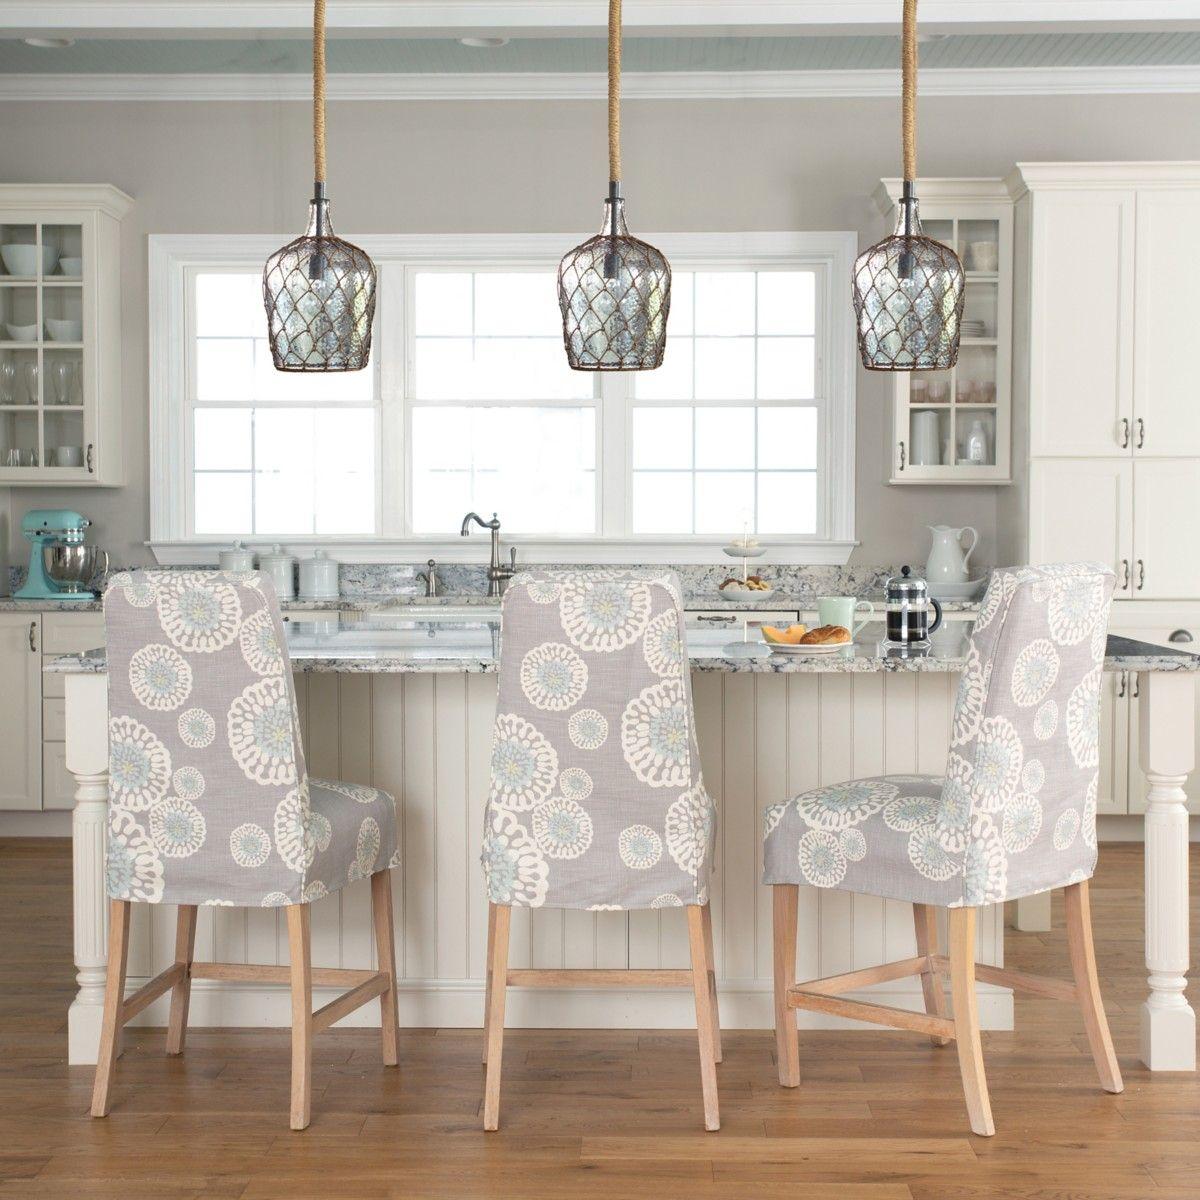 rhea pendant country kitchen designs white modern kitchen modern outdoor kitchen on outdoor kitchen vintage id=36677